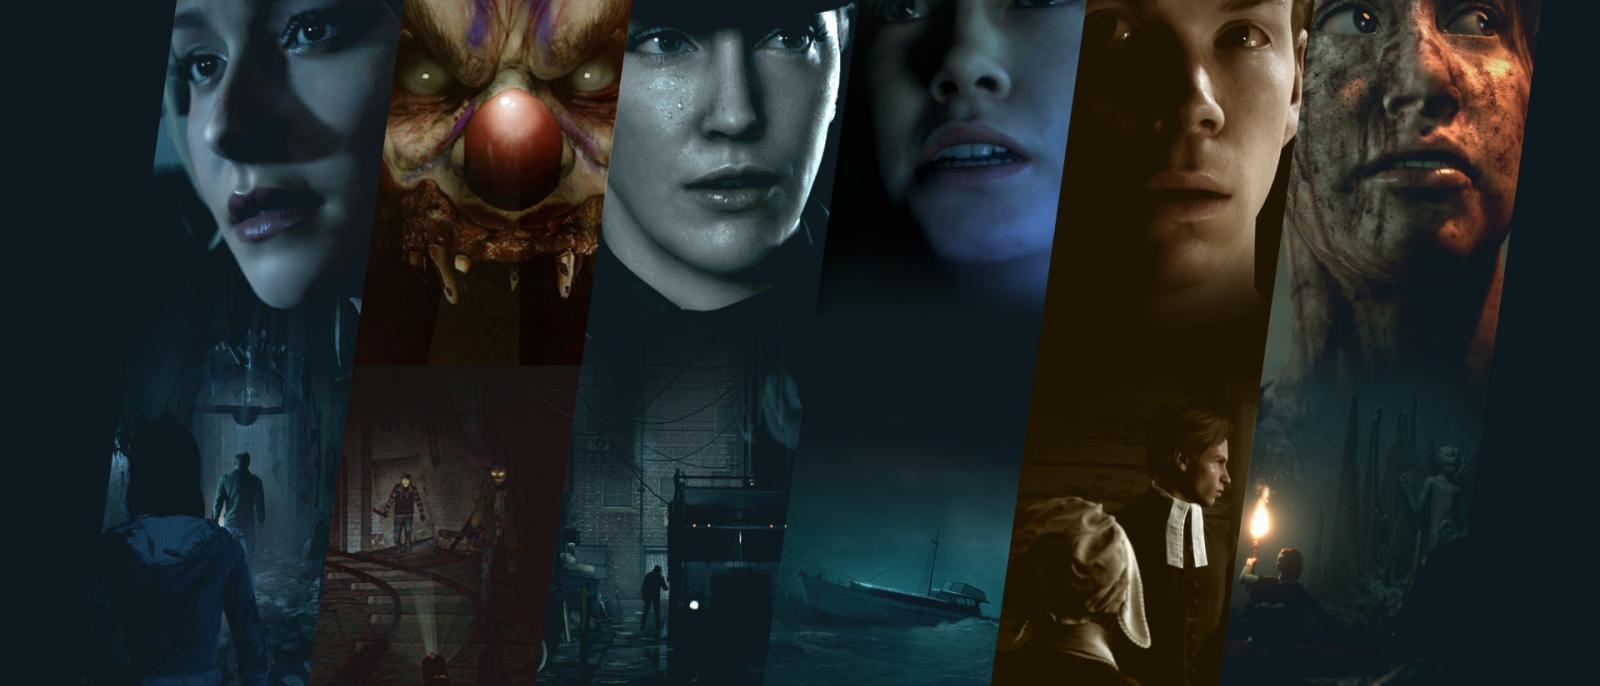 Nordisk Games инвестирует в разработчиков Until Dawn и The Dark Pictures Anthology